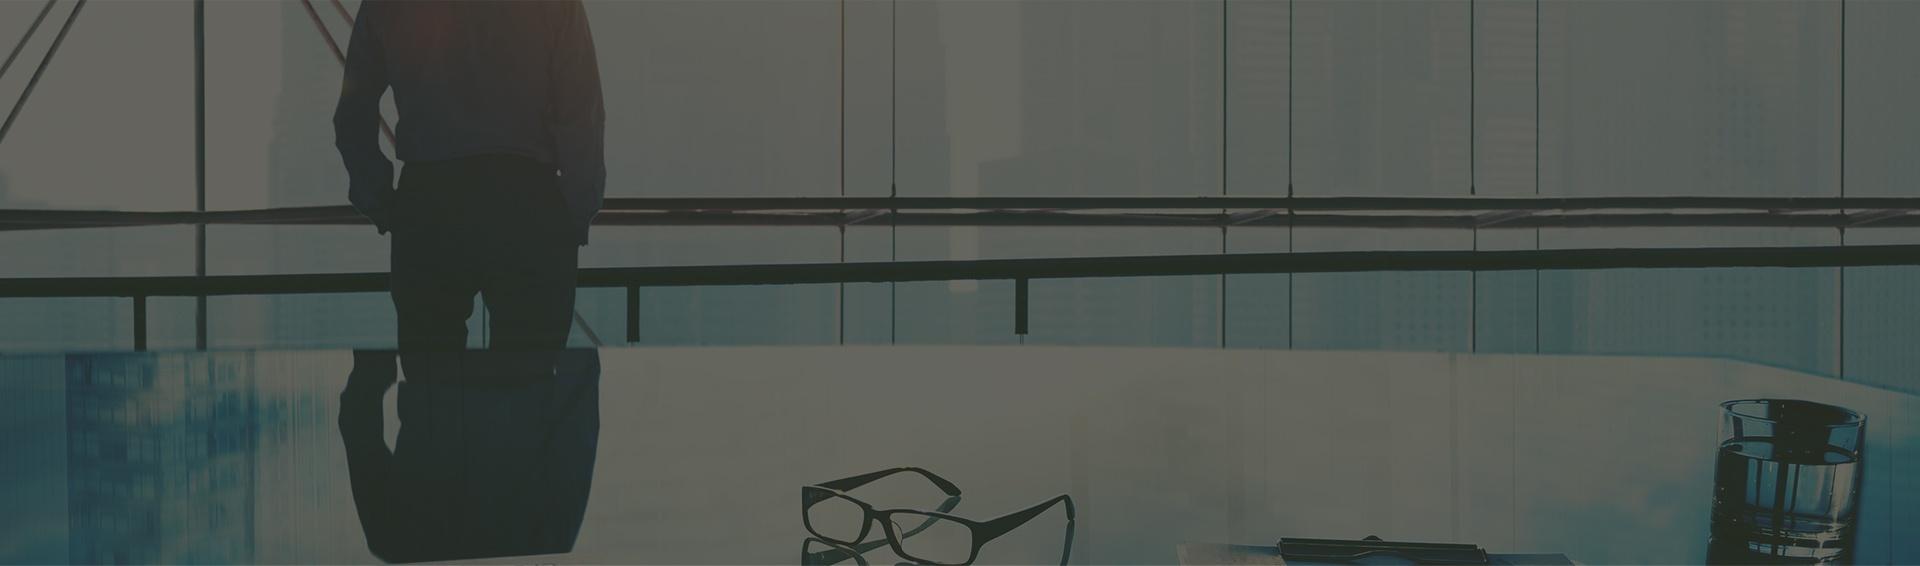 HCMWorks_Contingent-workforce.jpg